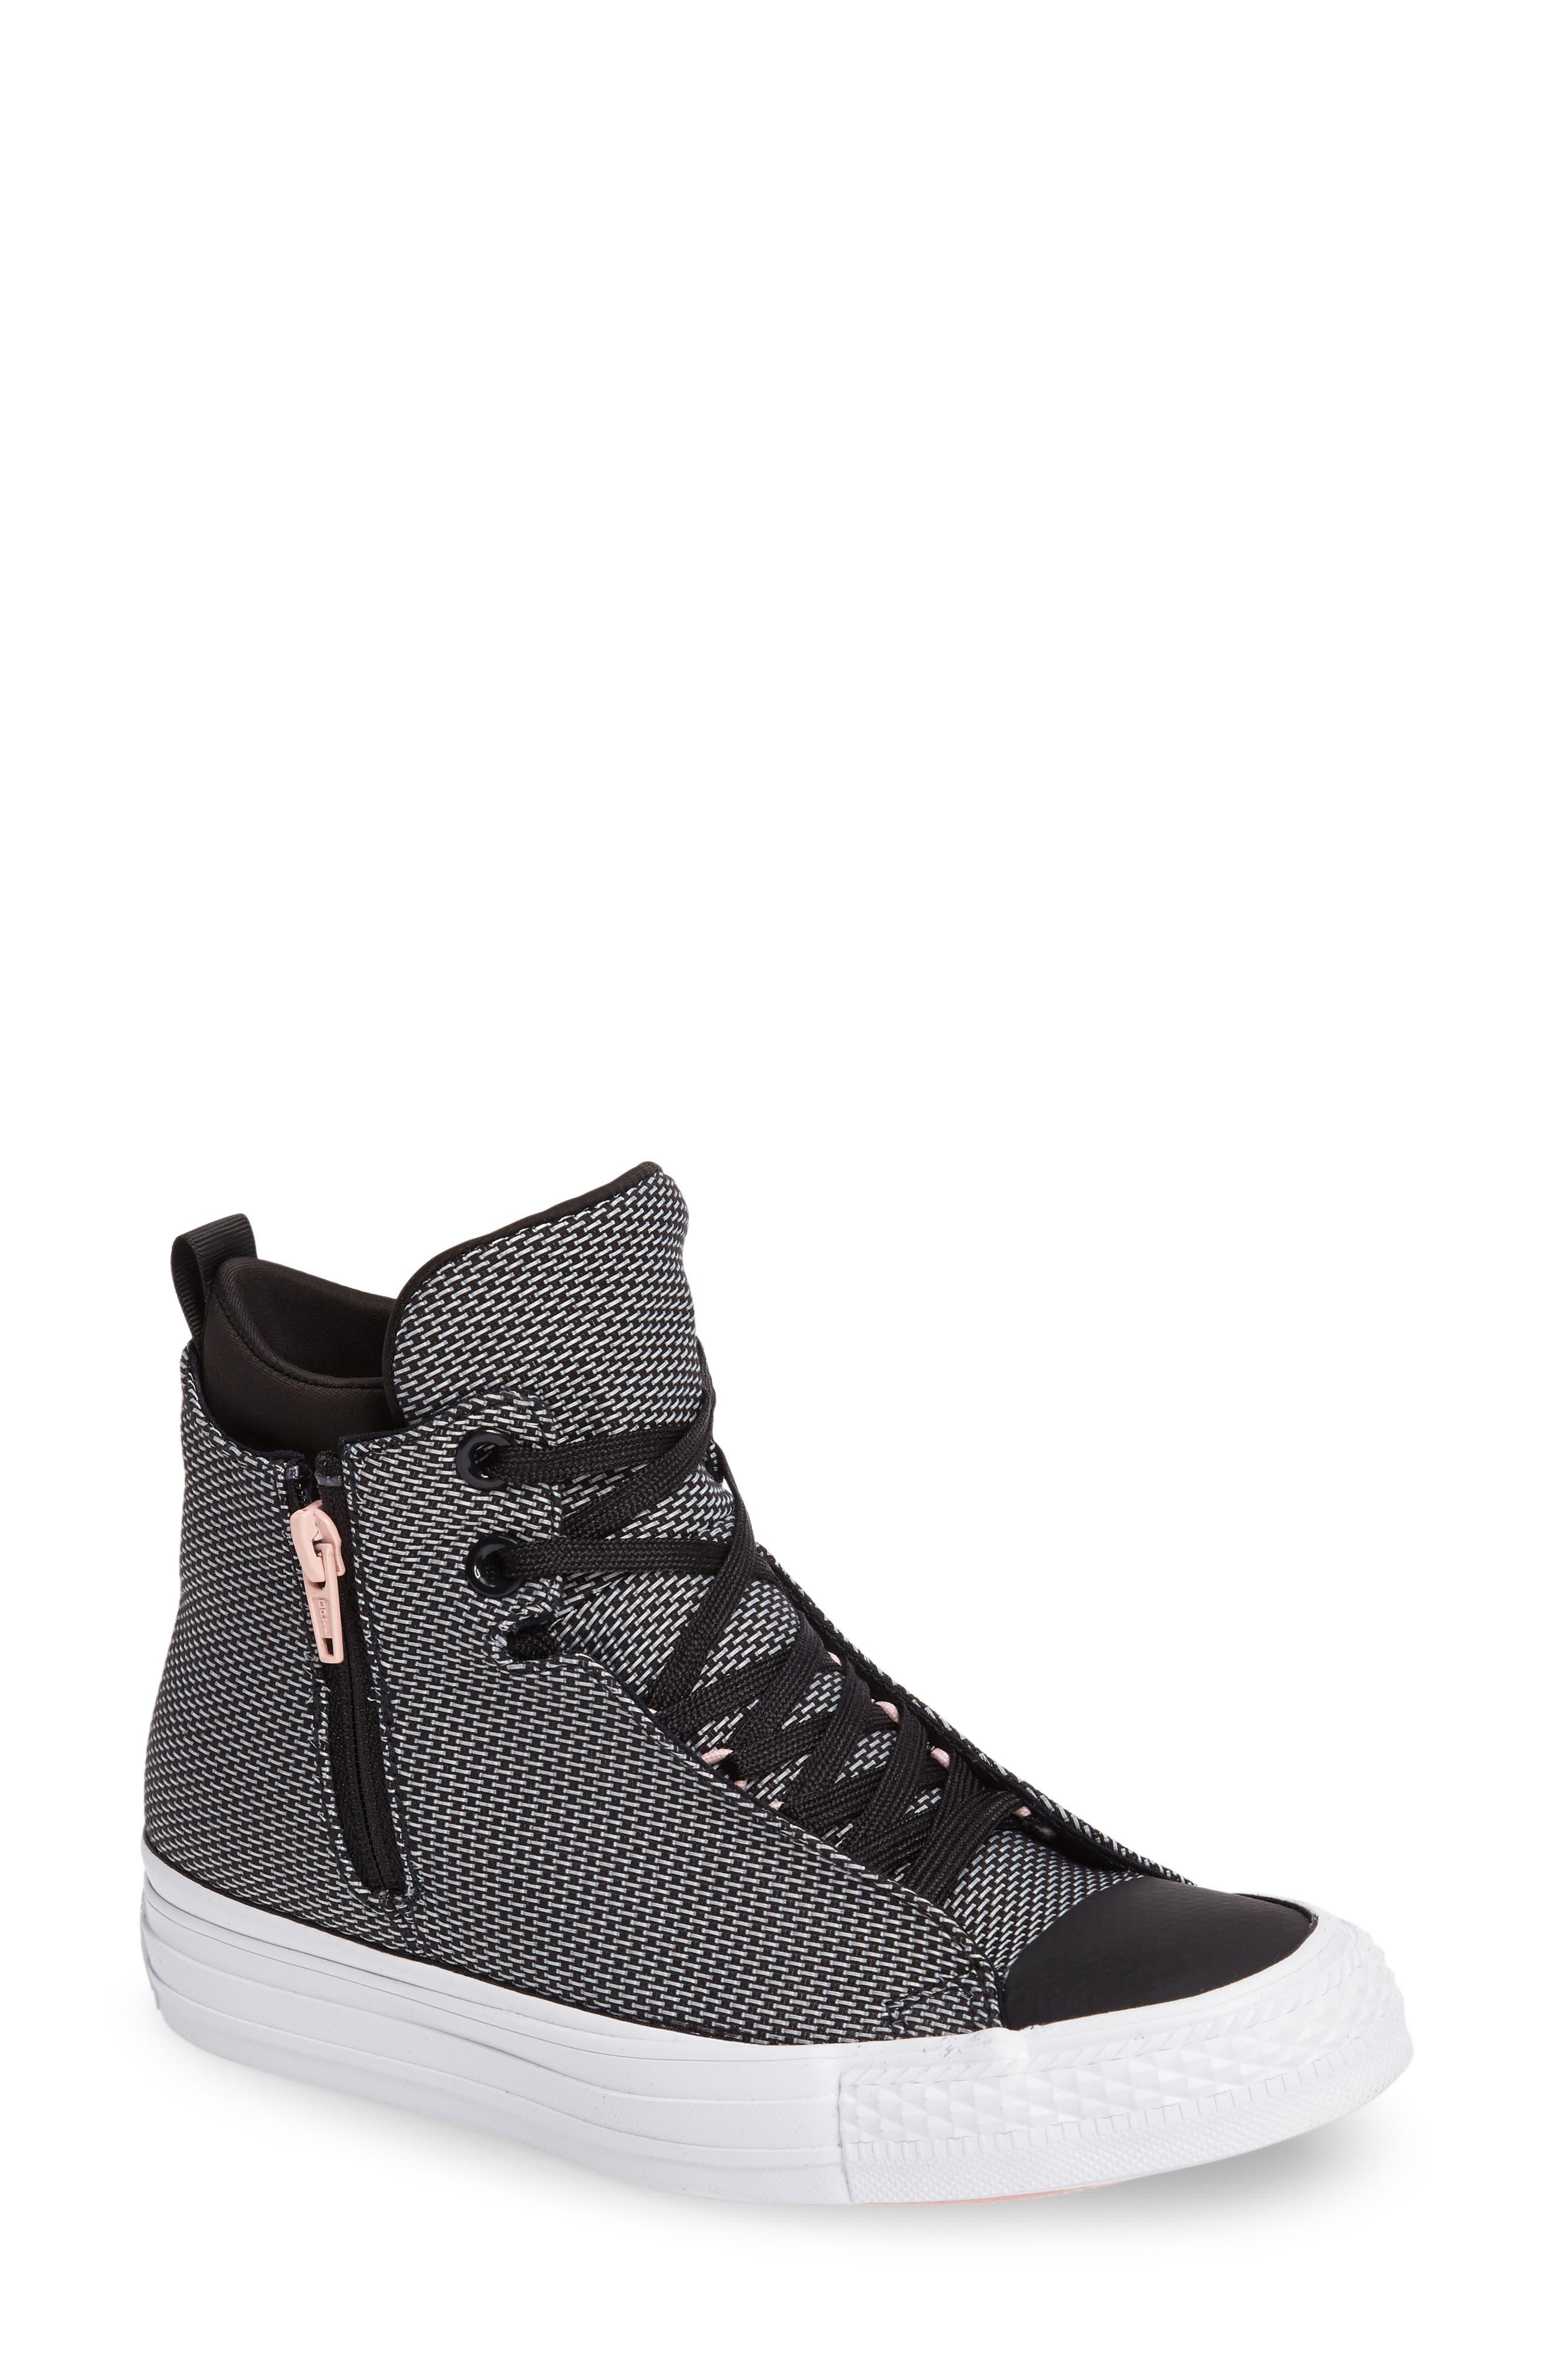 Main Image - Converse Chuck Taylor® All Star® Selene High Top Sneaker (Women)